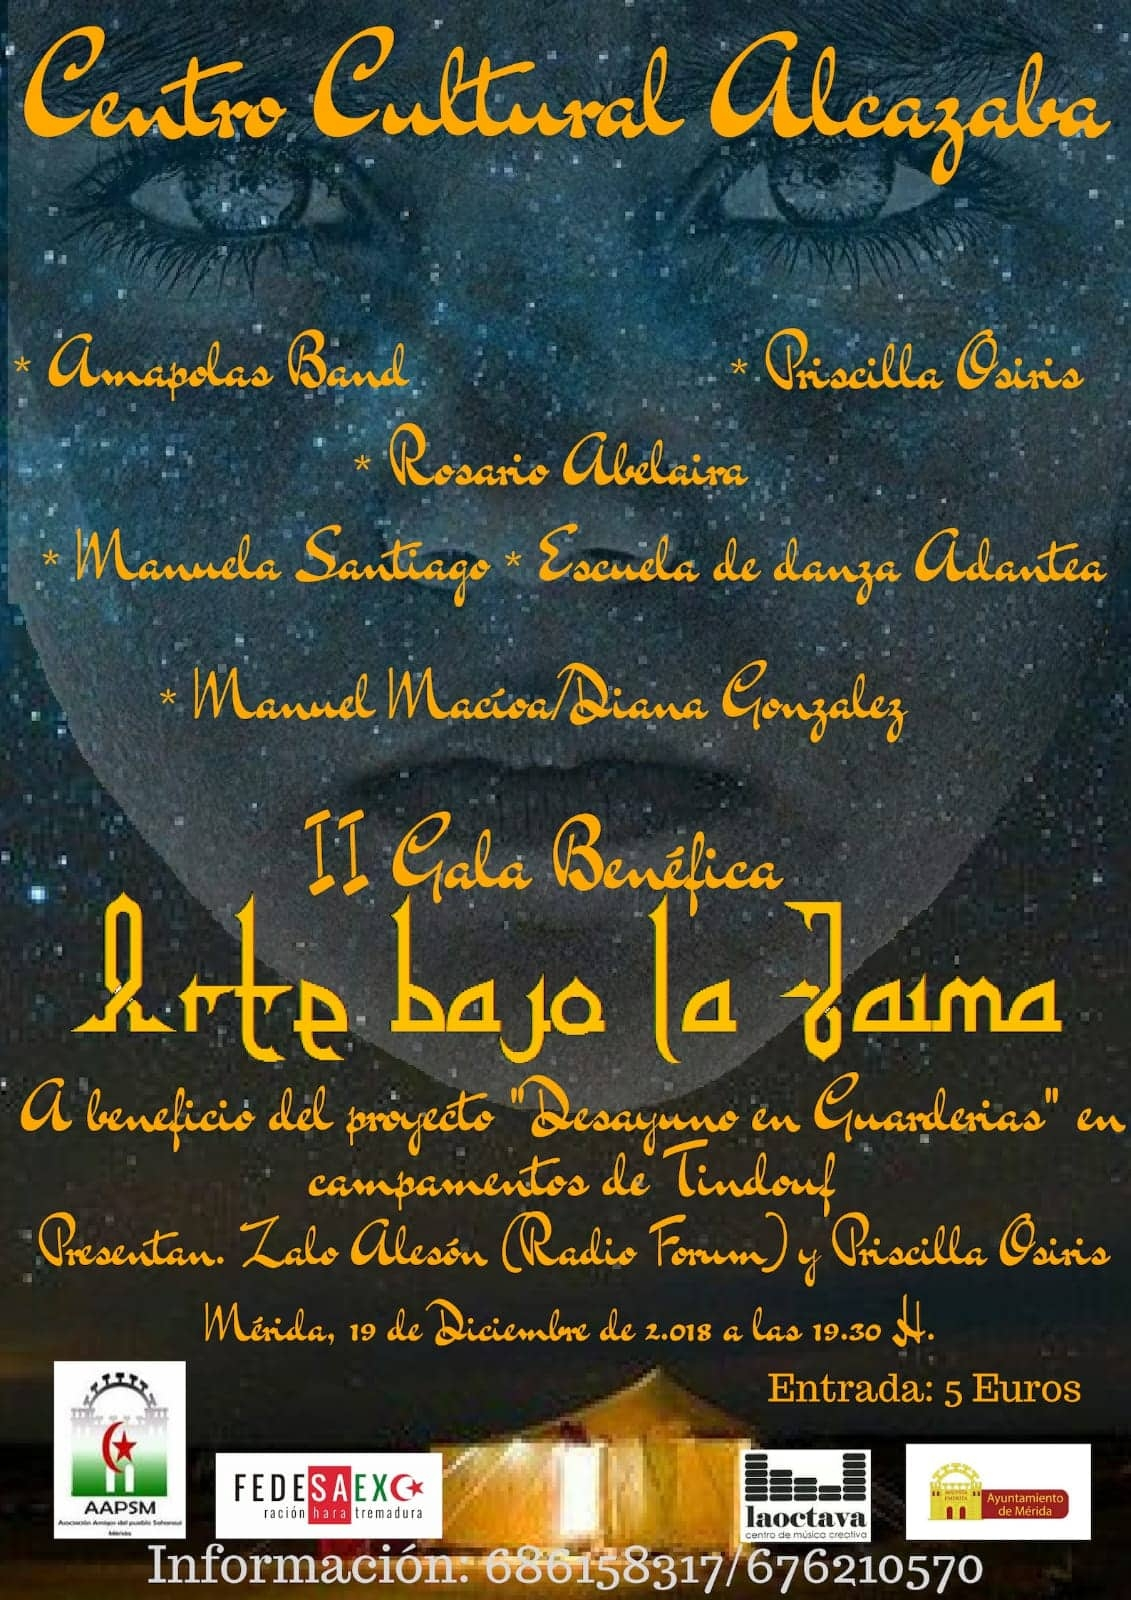 II Gala benéfica: Arte bajo la Jaima